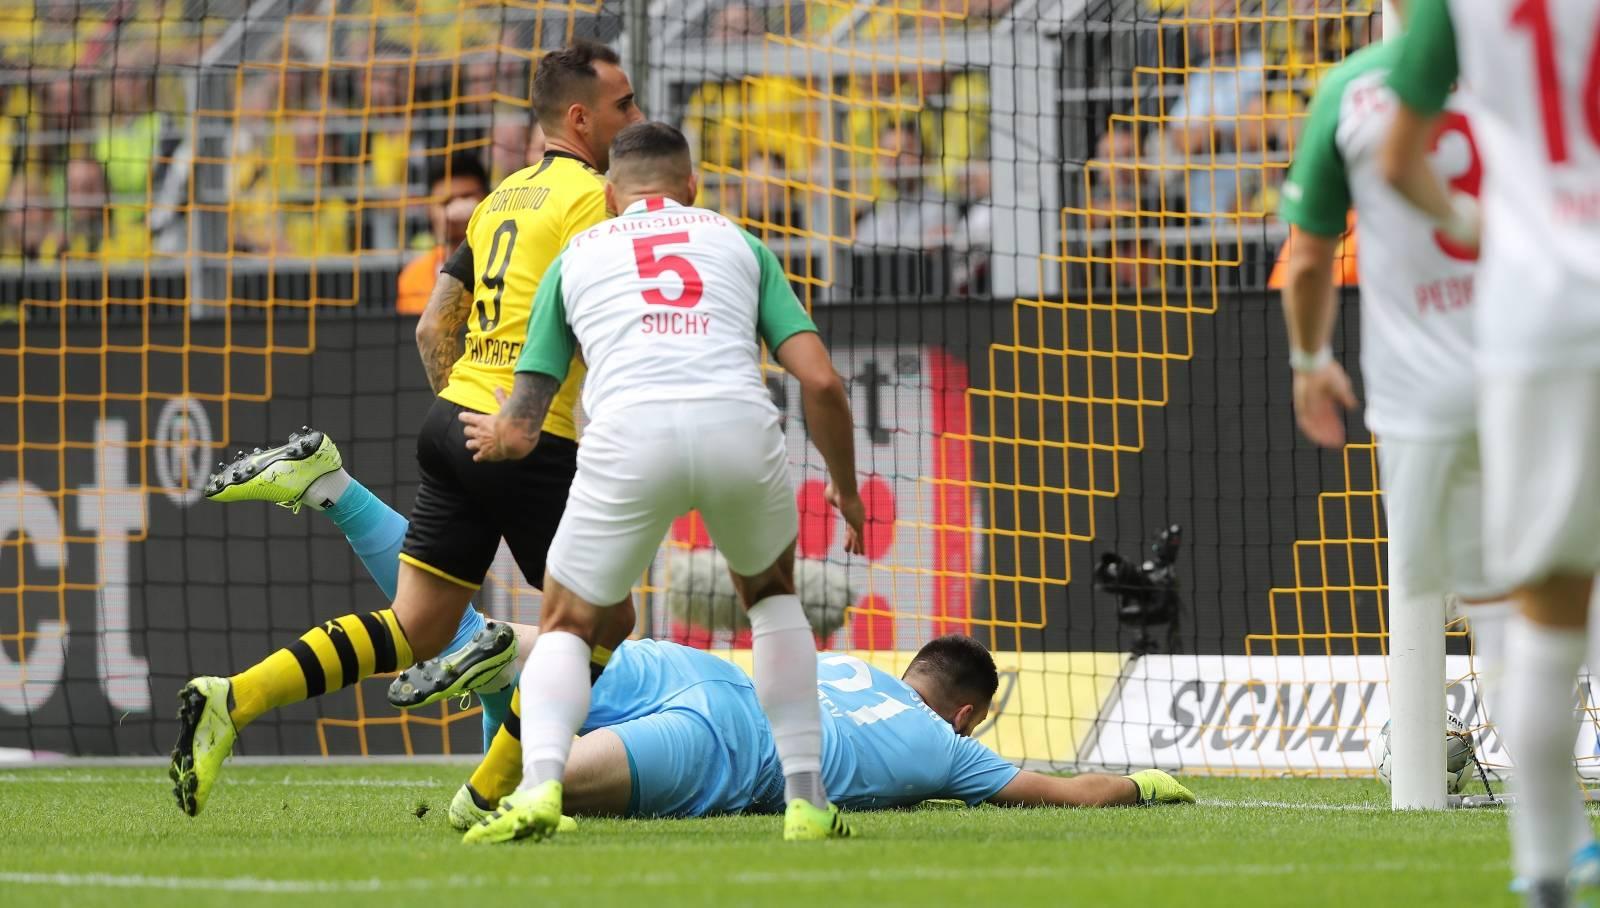 firo: 17.08.2019, football, 1.Bundesliga, season 2019/2020, BVB, Borussia Dortmund - FC Augsburg